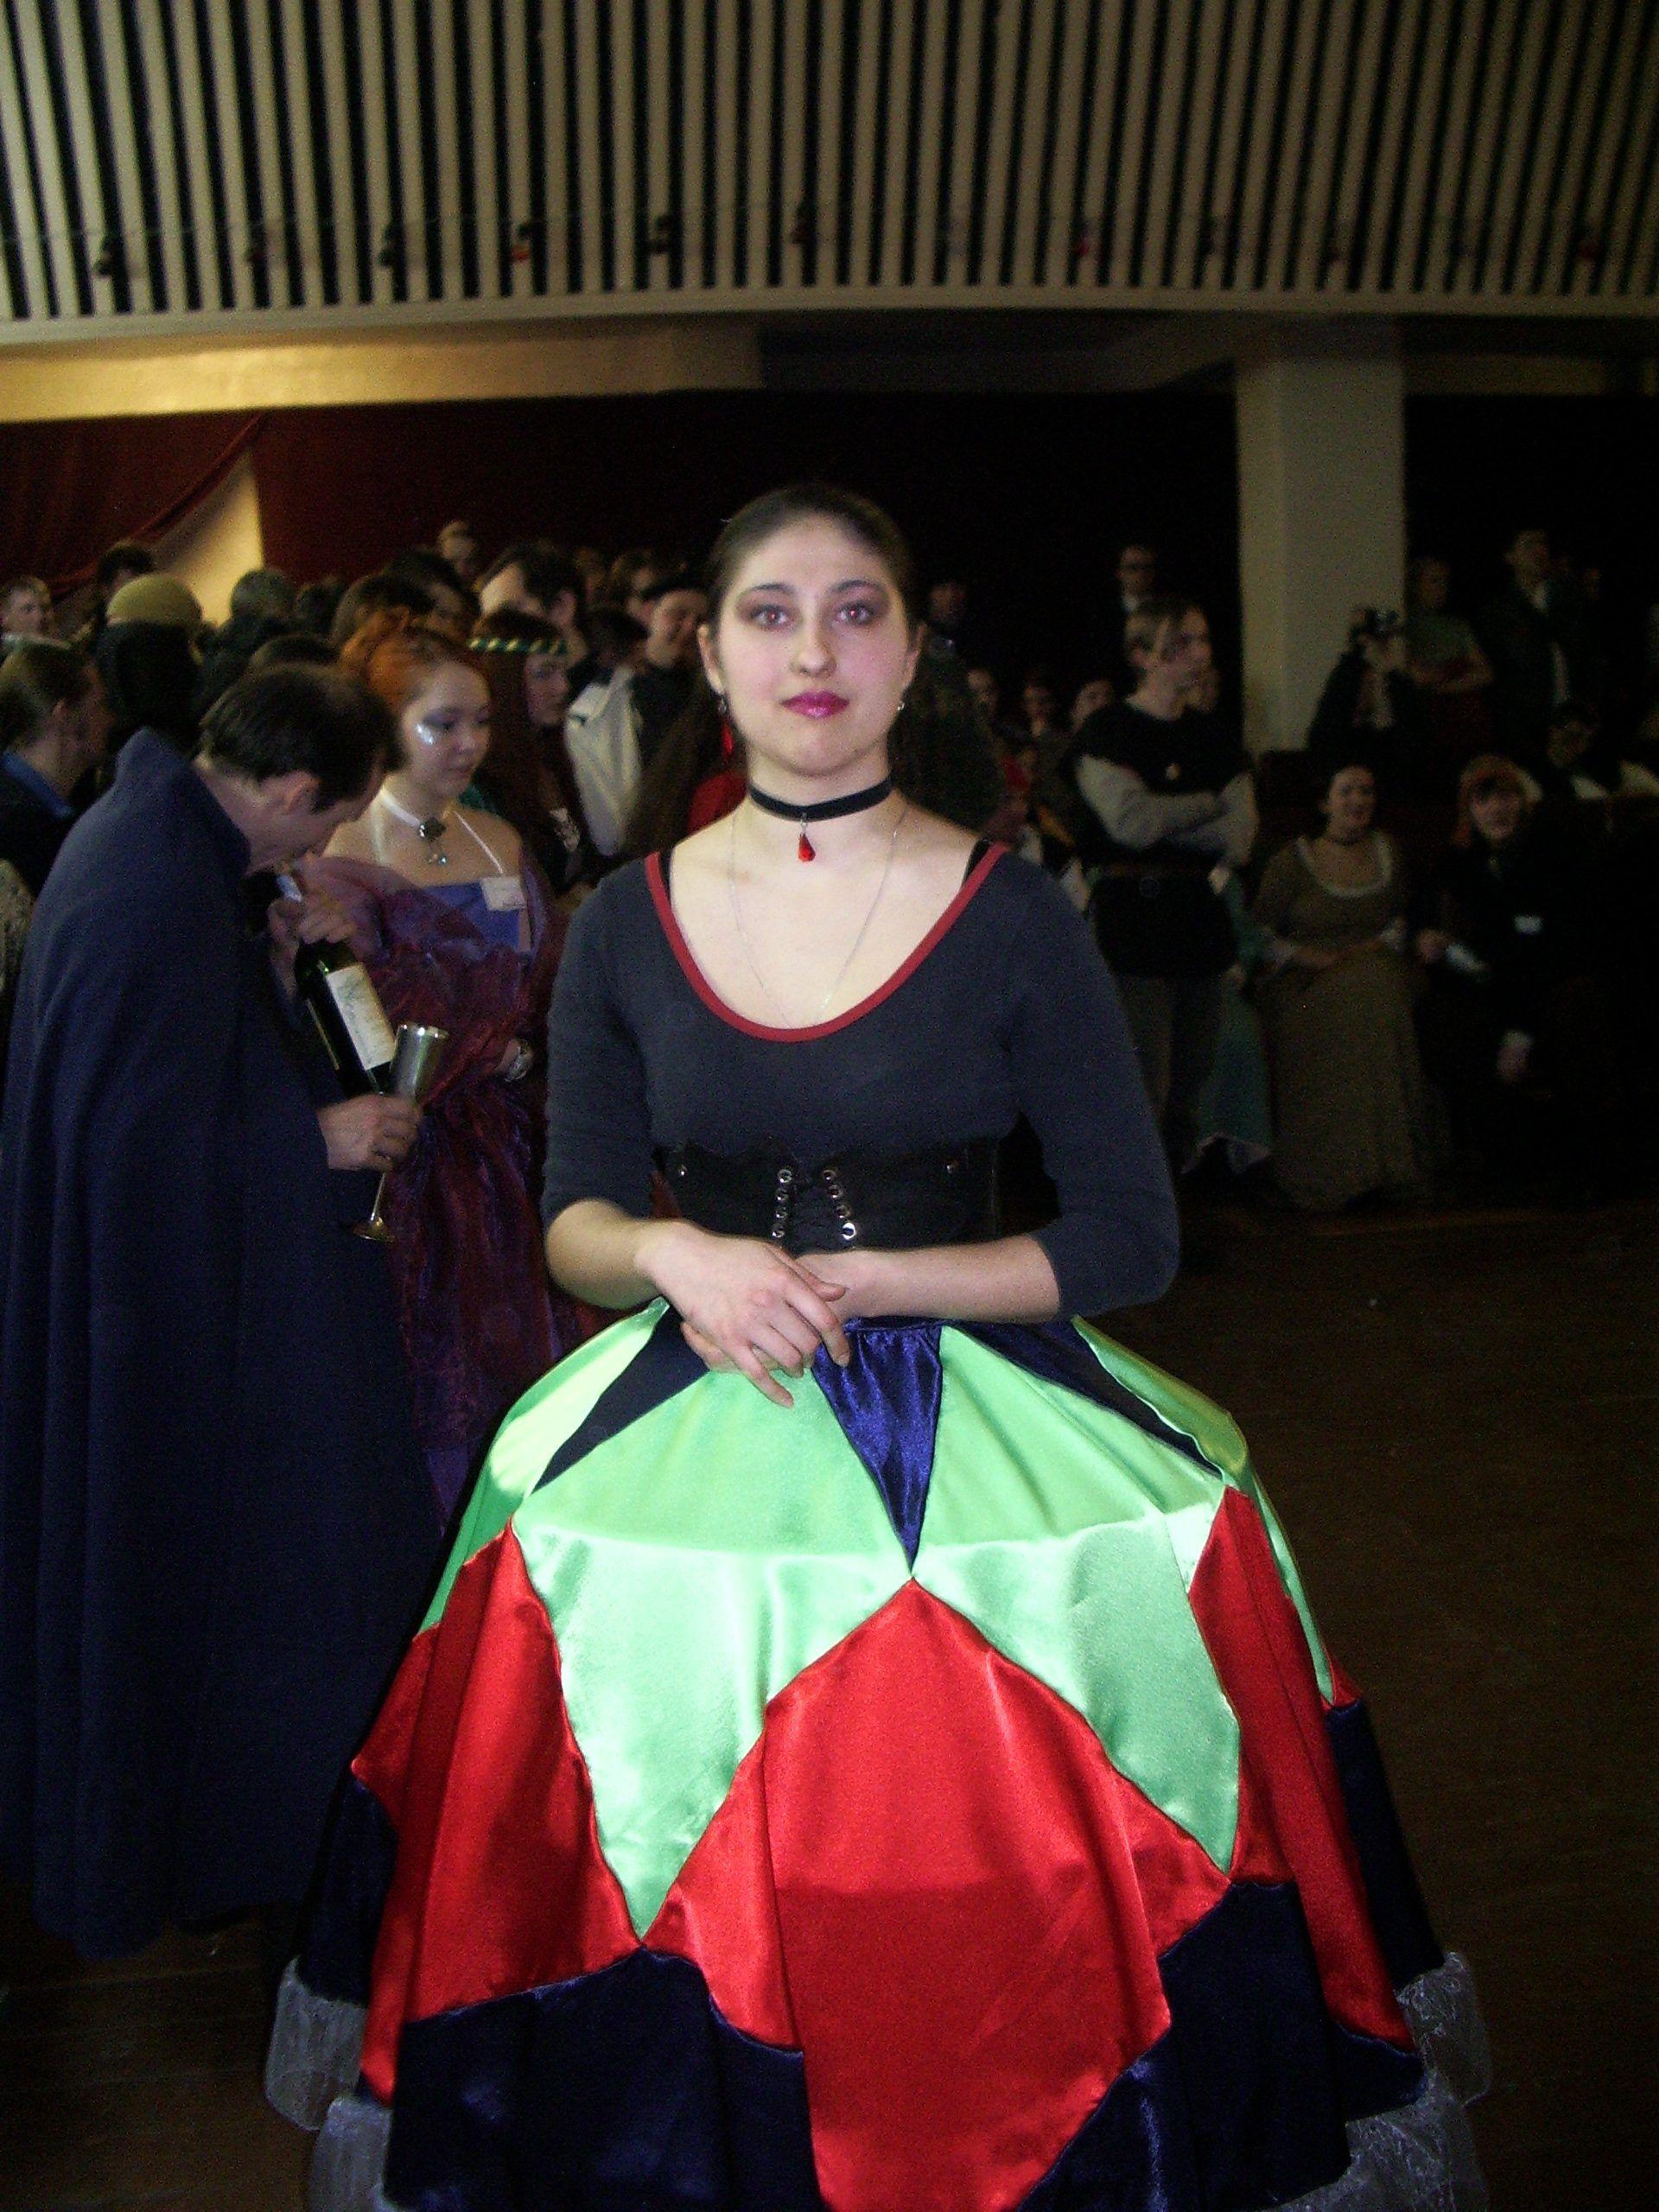 Молли на своем первом балу. Фото предоставила Вера Ушкевич